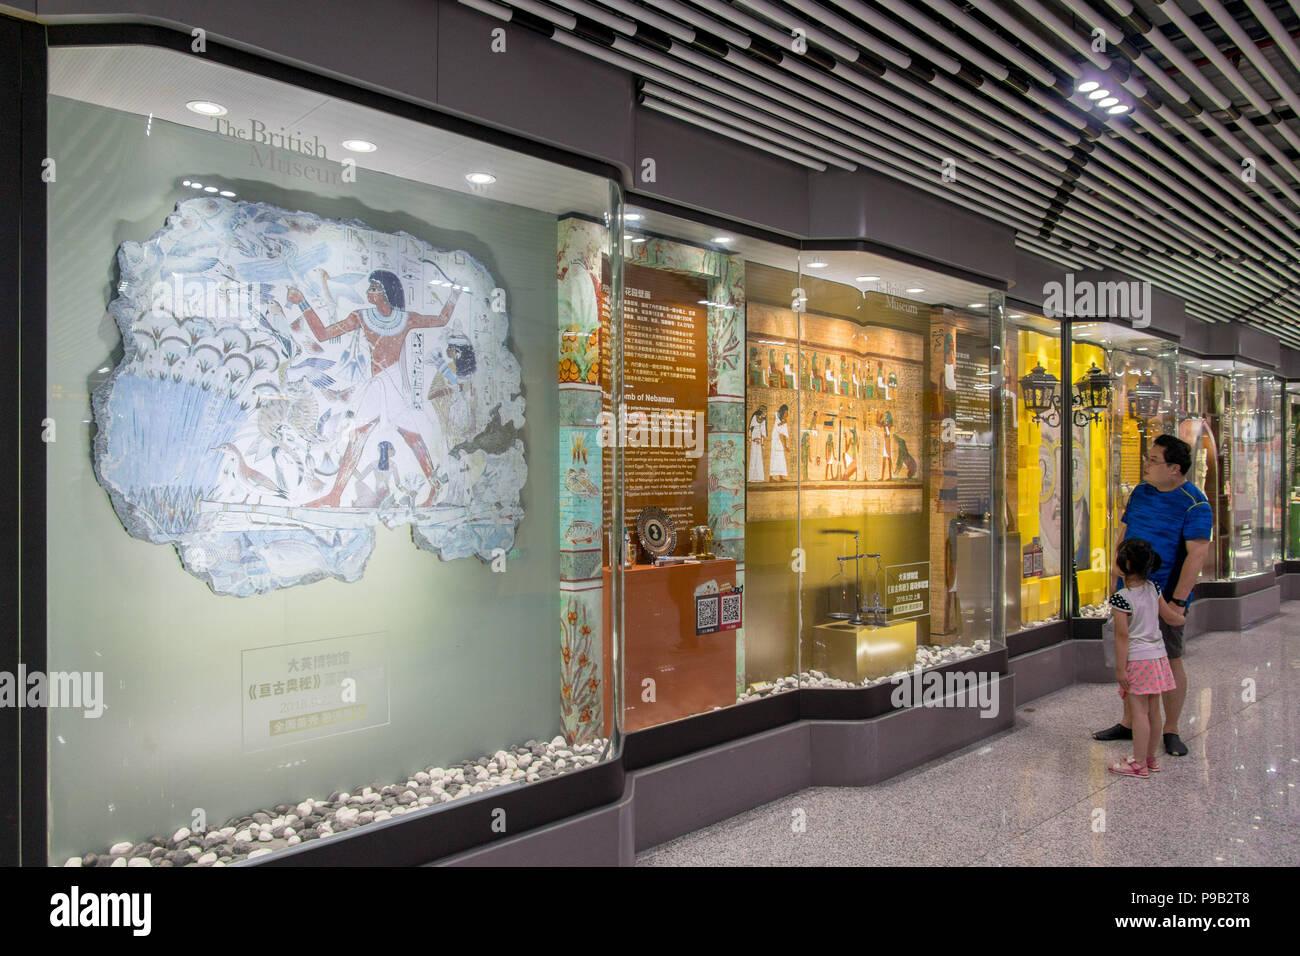 Derivative Stock Photos Images Alamy Zuma Wiring Diagram Shanghai China 17th July 2018